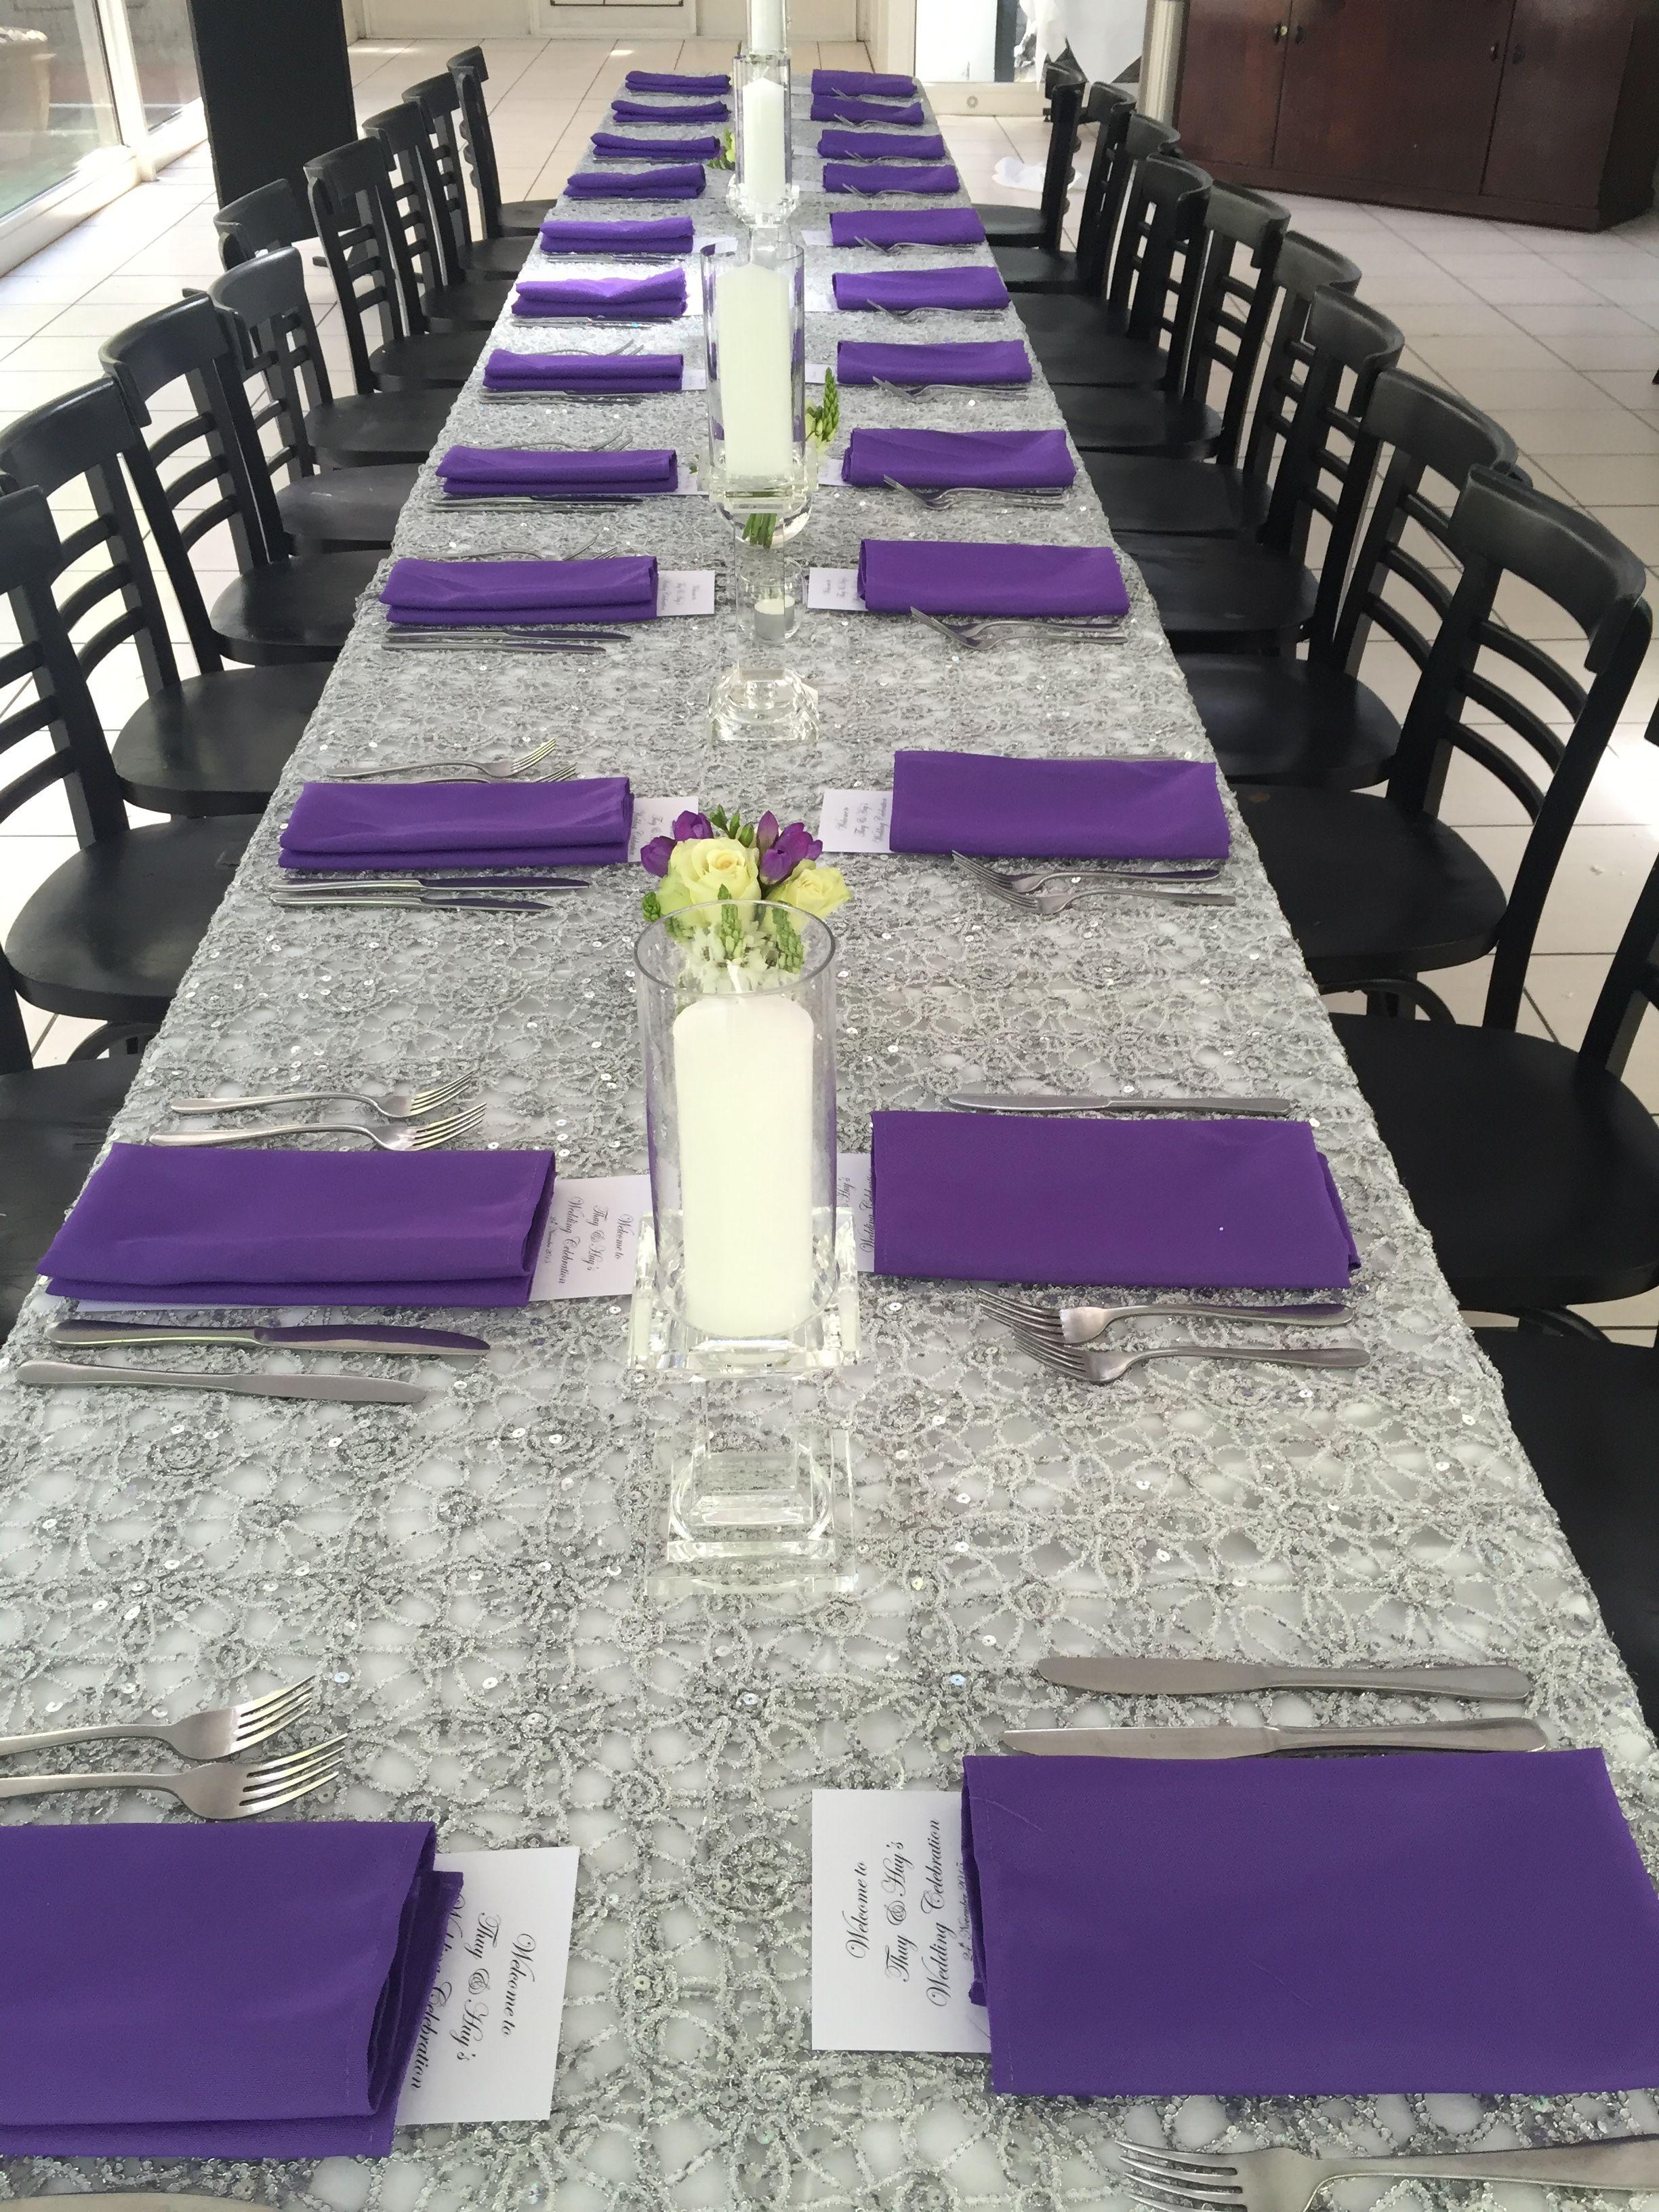 Decorit Events silver lace linen with purple napkins rental lace tablecloths  linen  Lace Tablecloth Wedding  Decorit Events silver lace linen with purple napkins  linen rental  . Purple Tablecloths For Wedding. Home Design Ideas